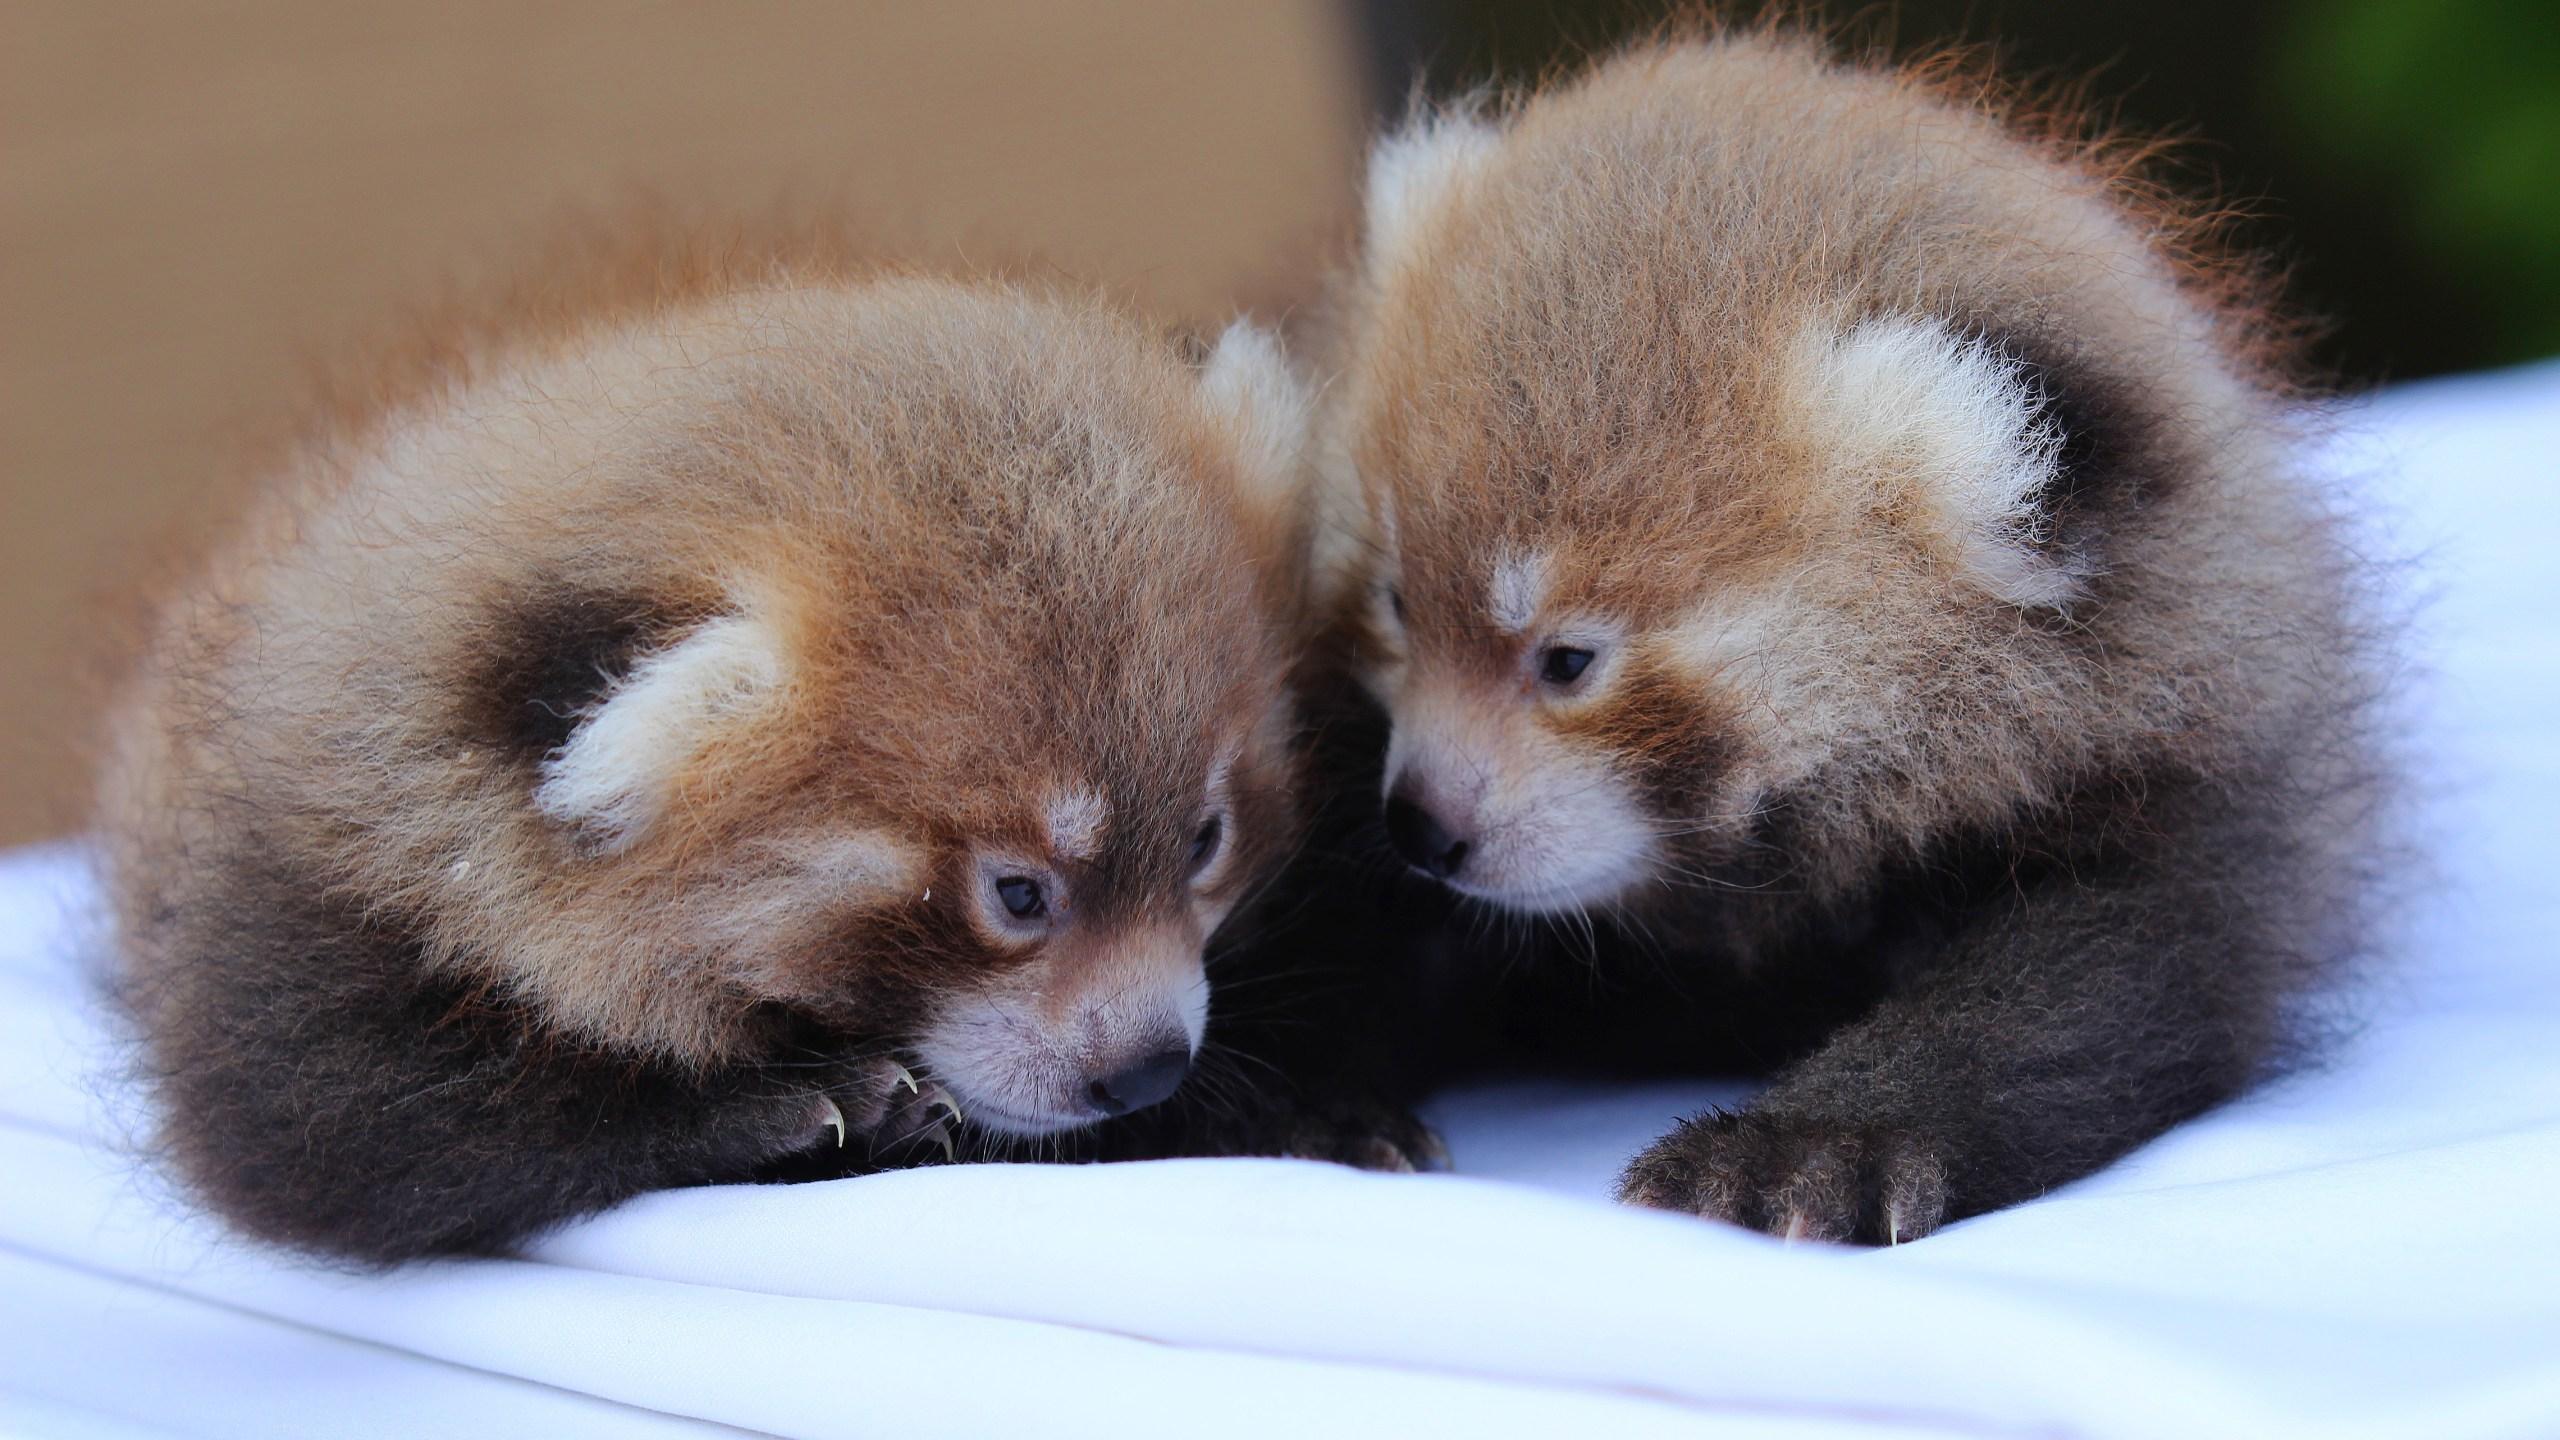 baby red pandas 7-31-18 (3)_1533052258008.jpg-118809342.jpg